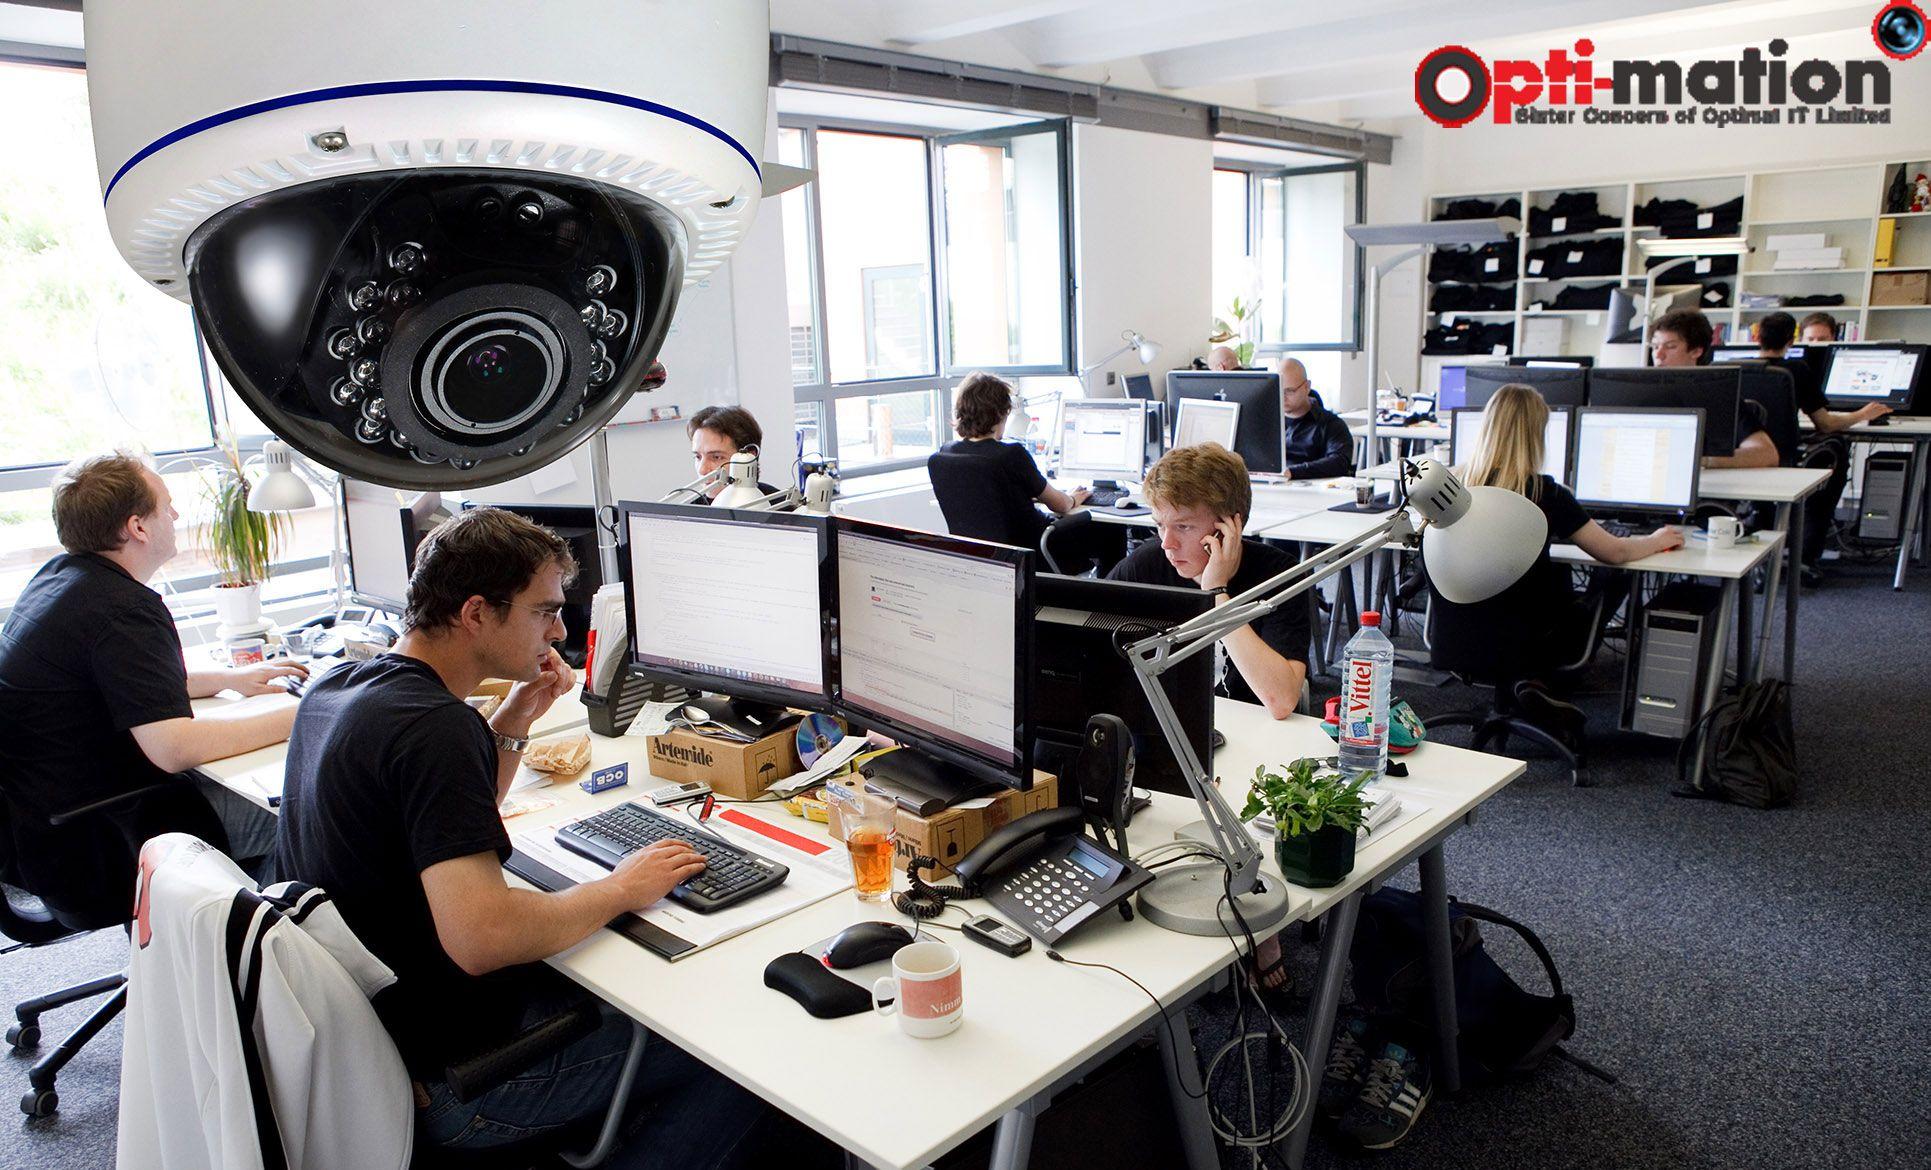 Provider of CCTV Camera in Bangladesh,Ip Camera,DVR,NVR,Access